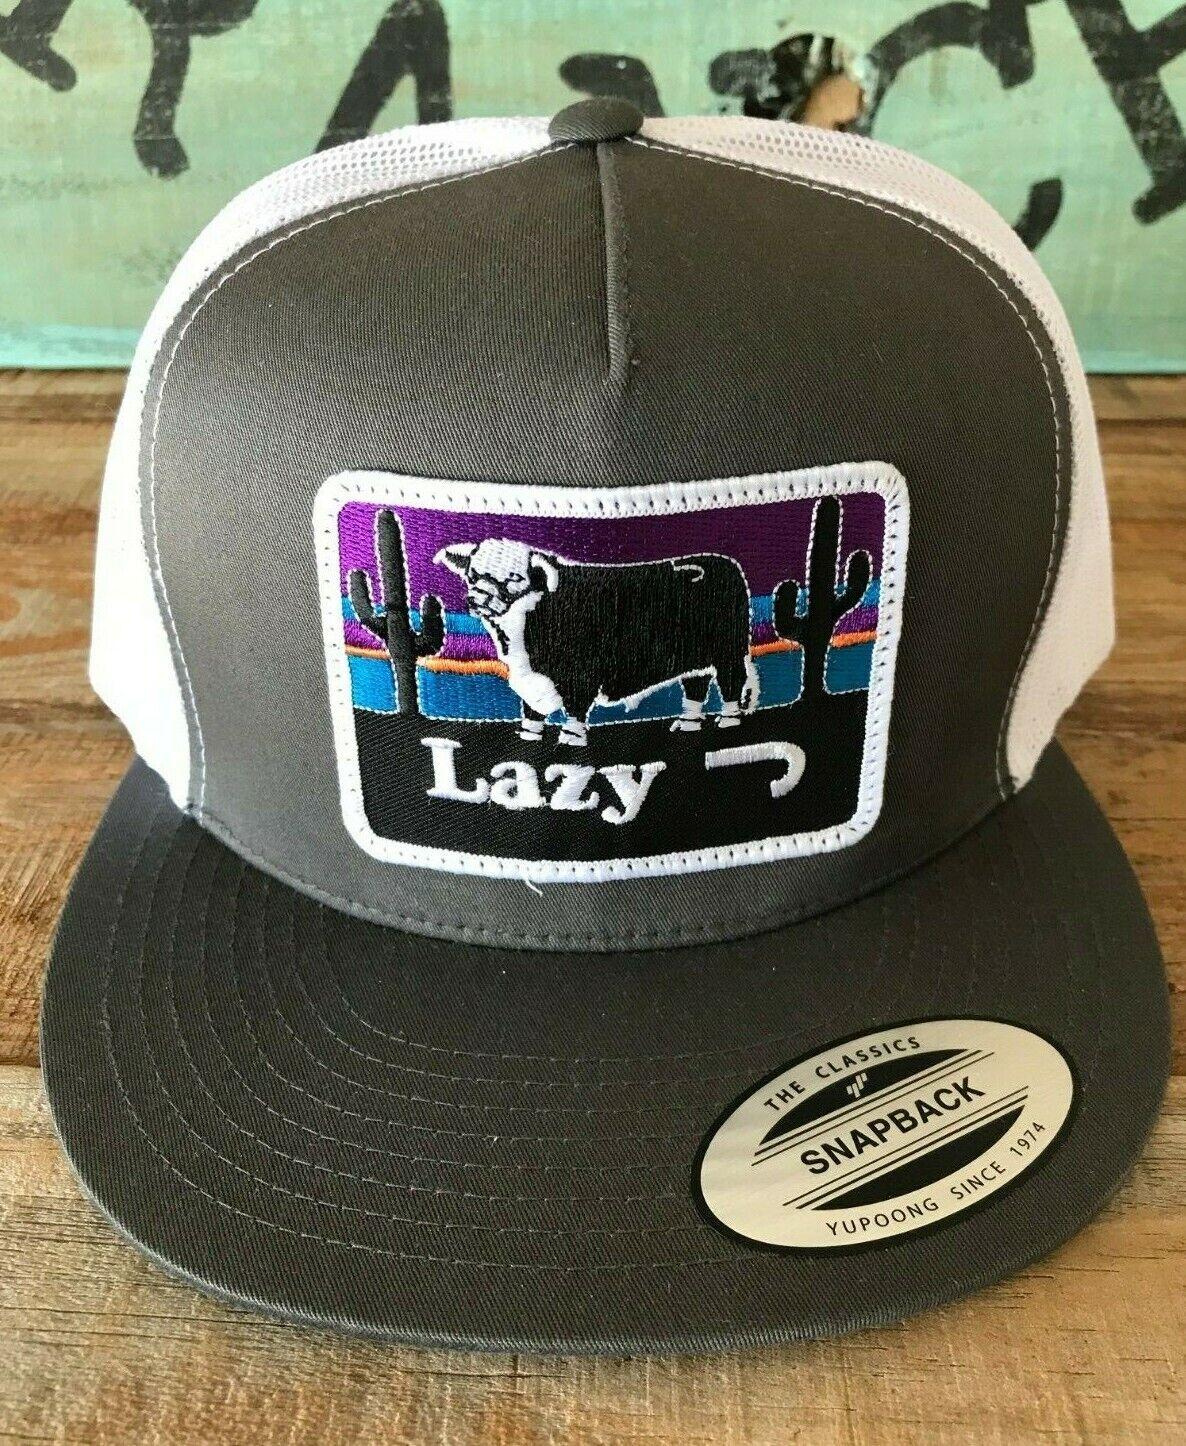 Lazy J Ranch Wear Black and White Serape Elevation Yupoong Snapback